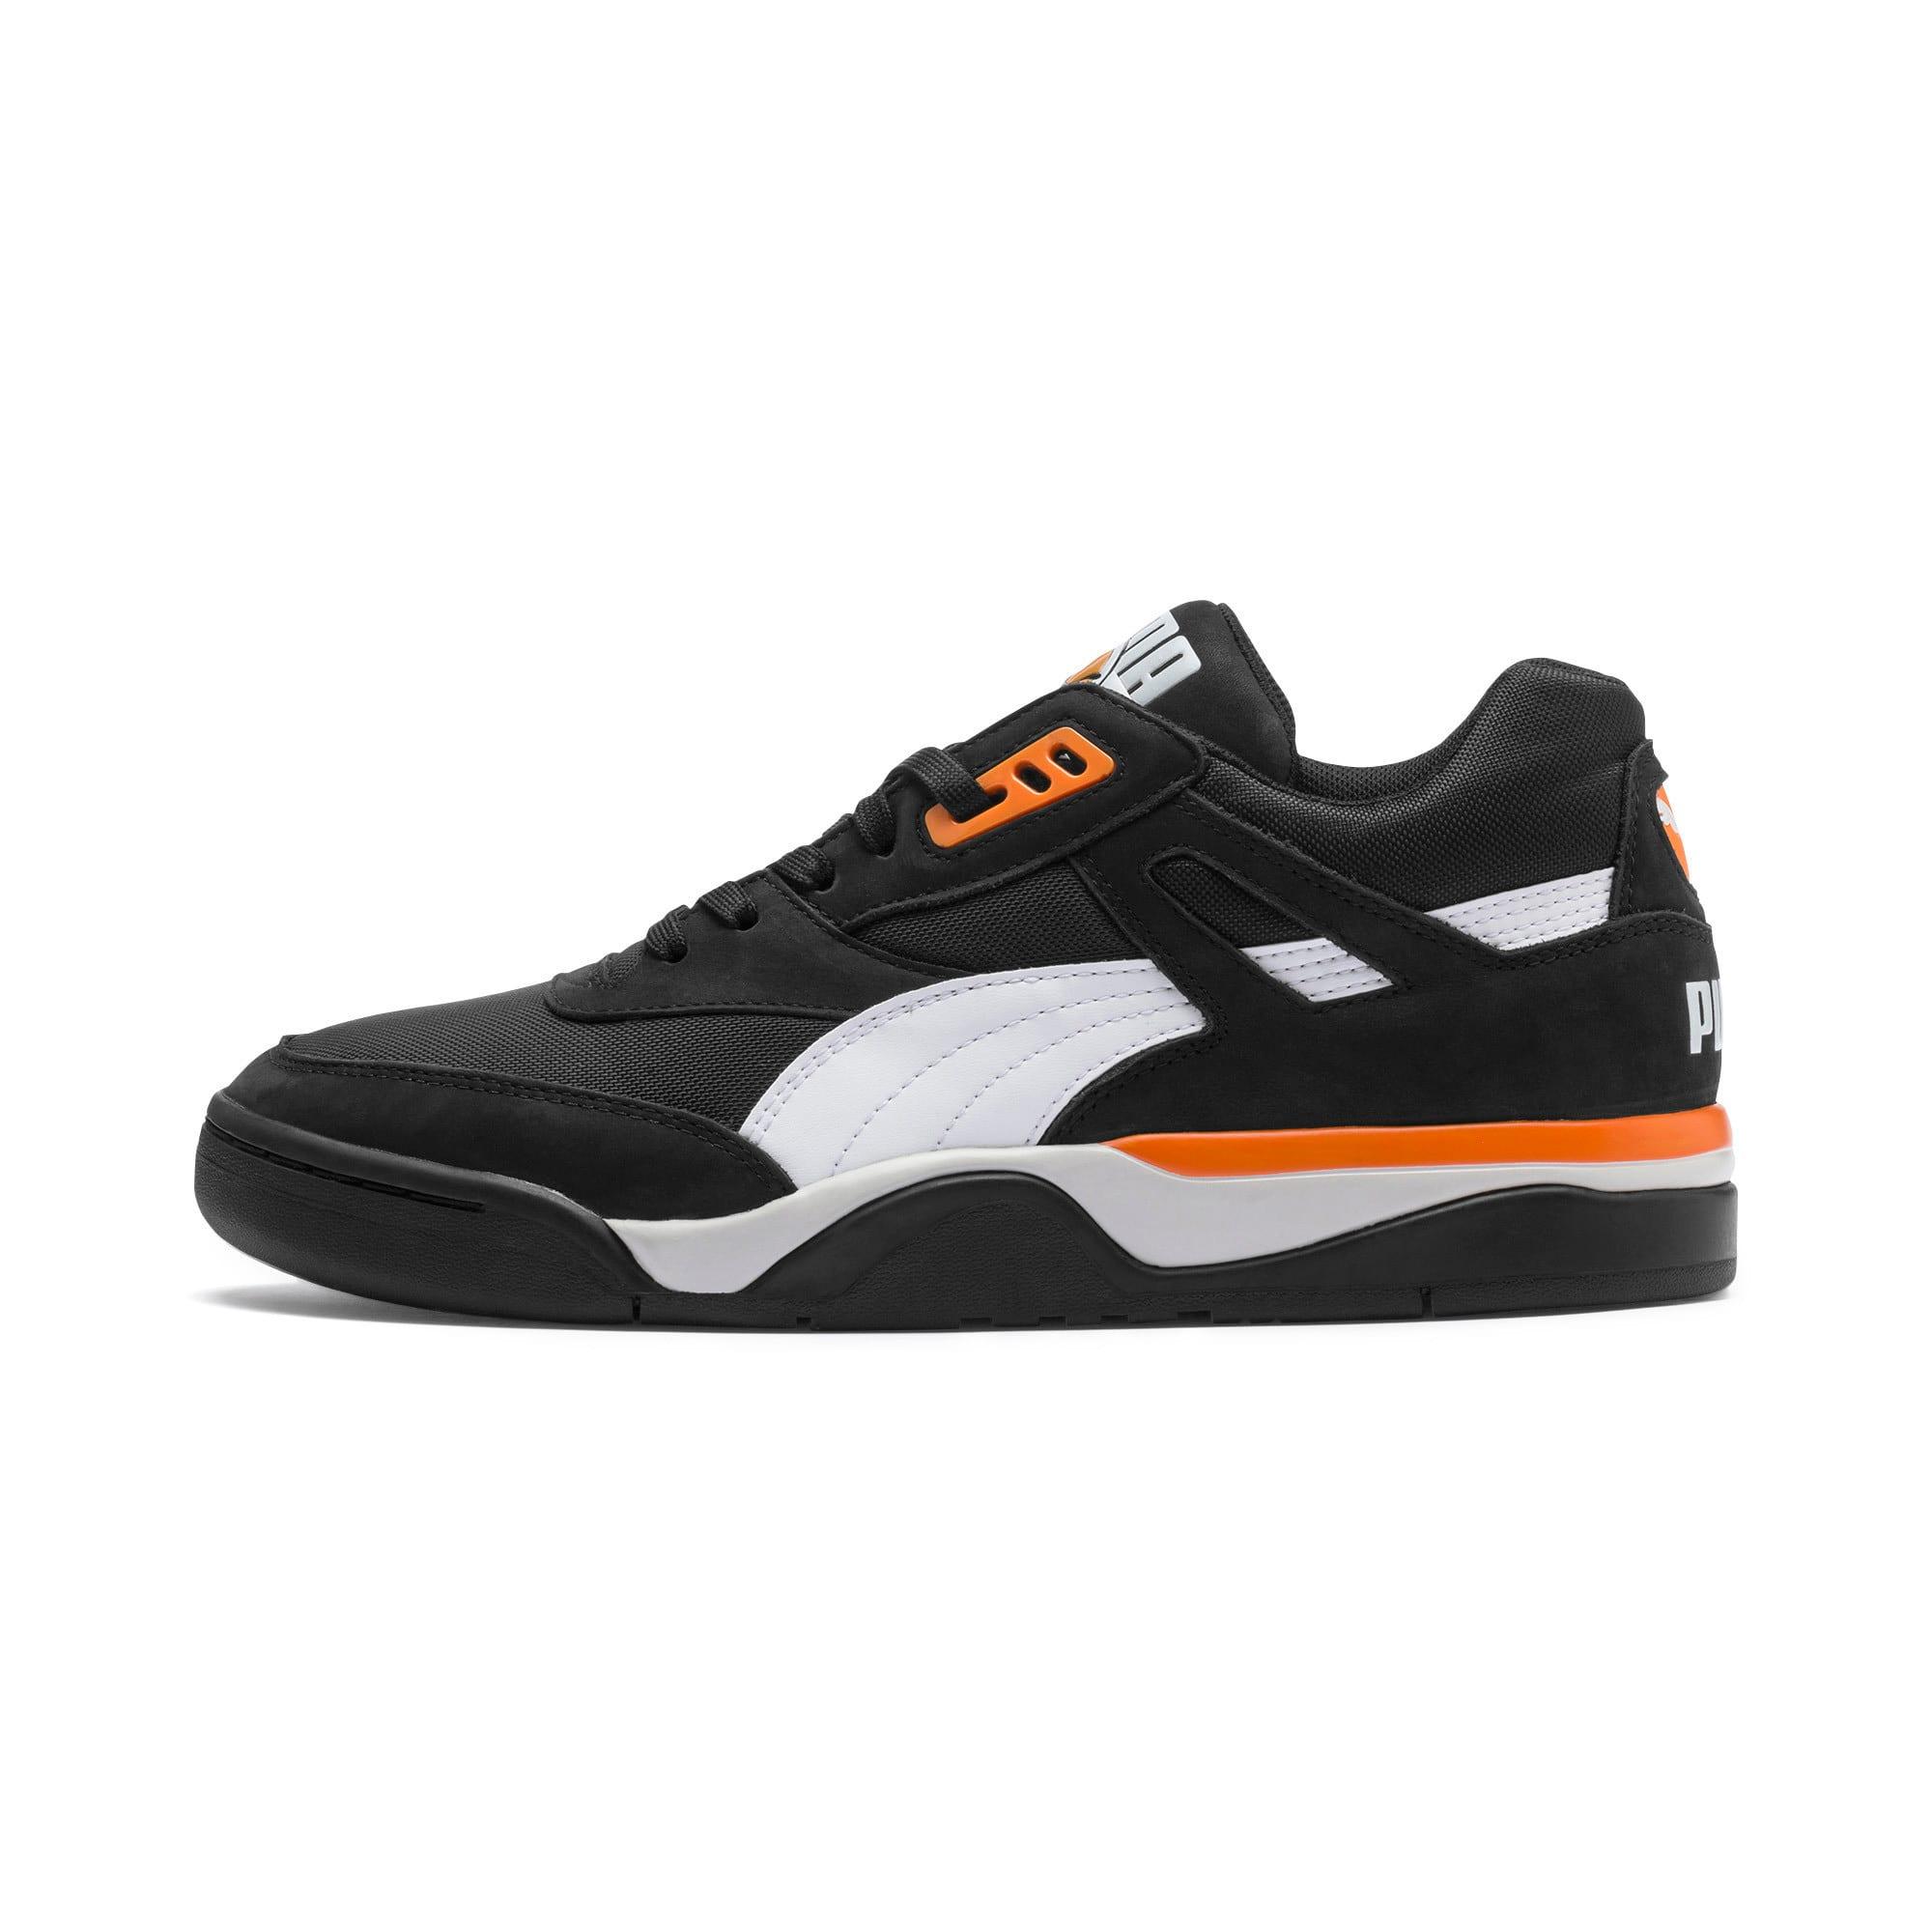 Thumbnail 1 of Palace Guard Bad Boys Sneaker, Puma Black-Puma White-, medium